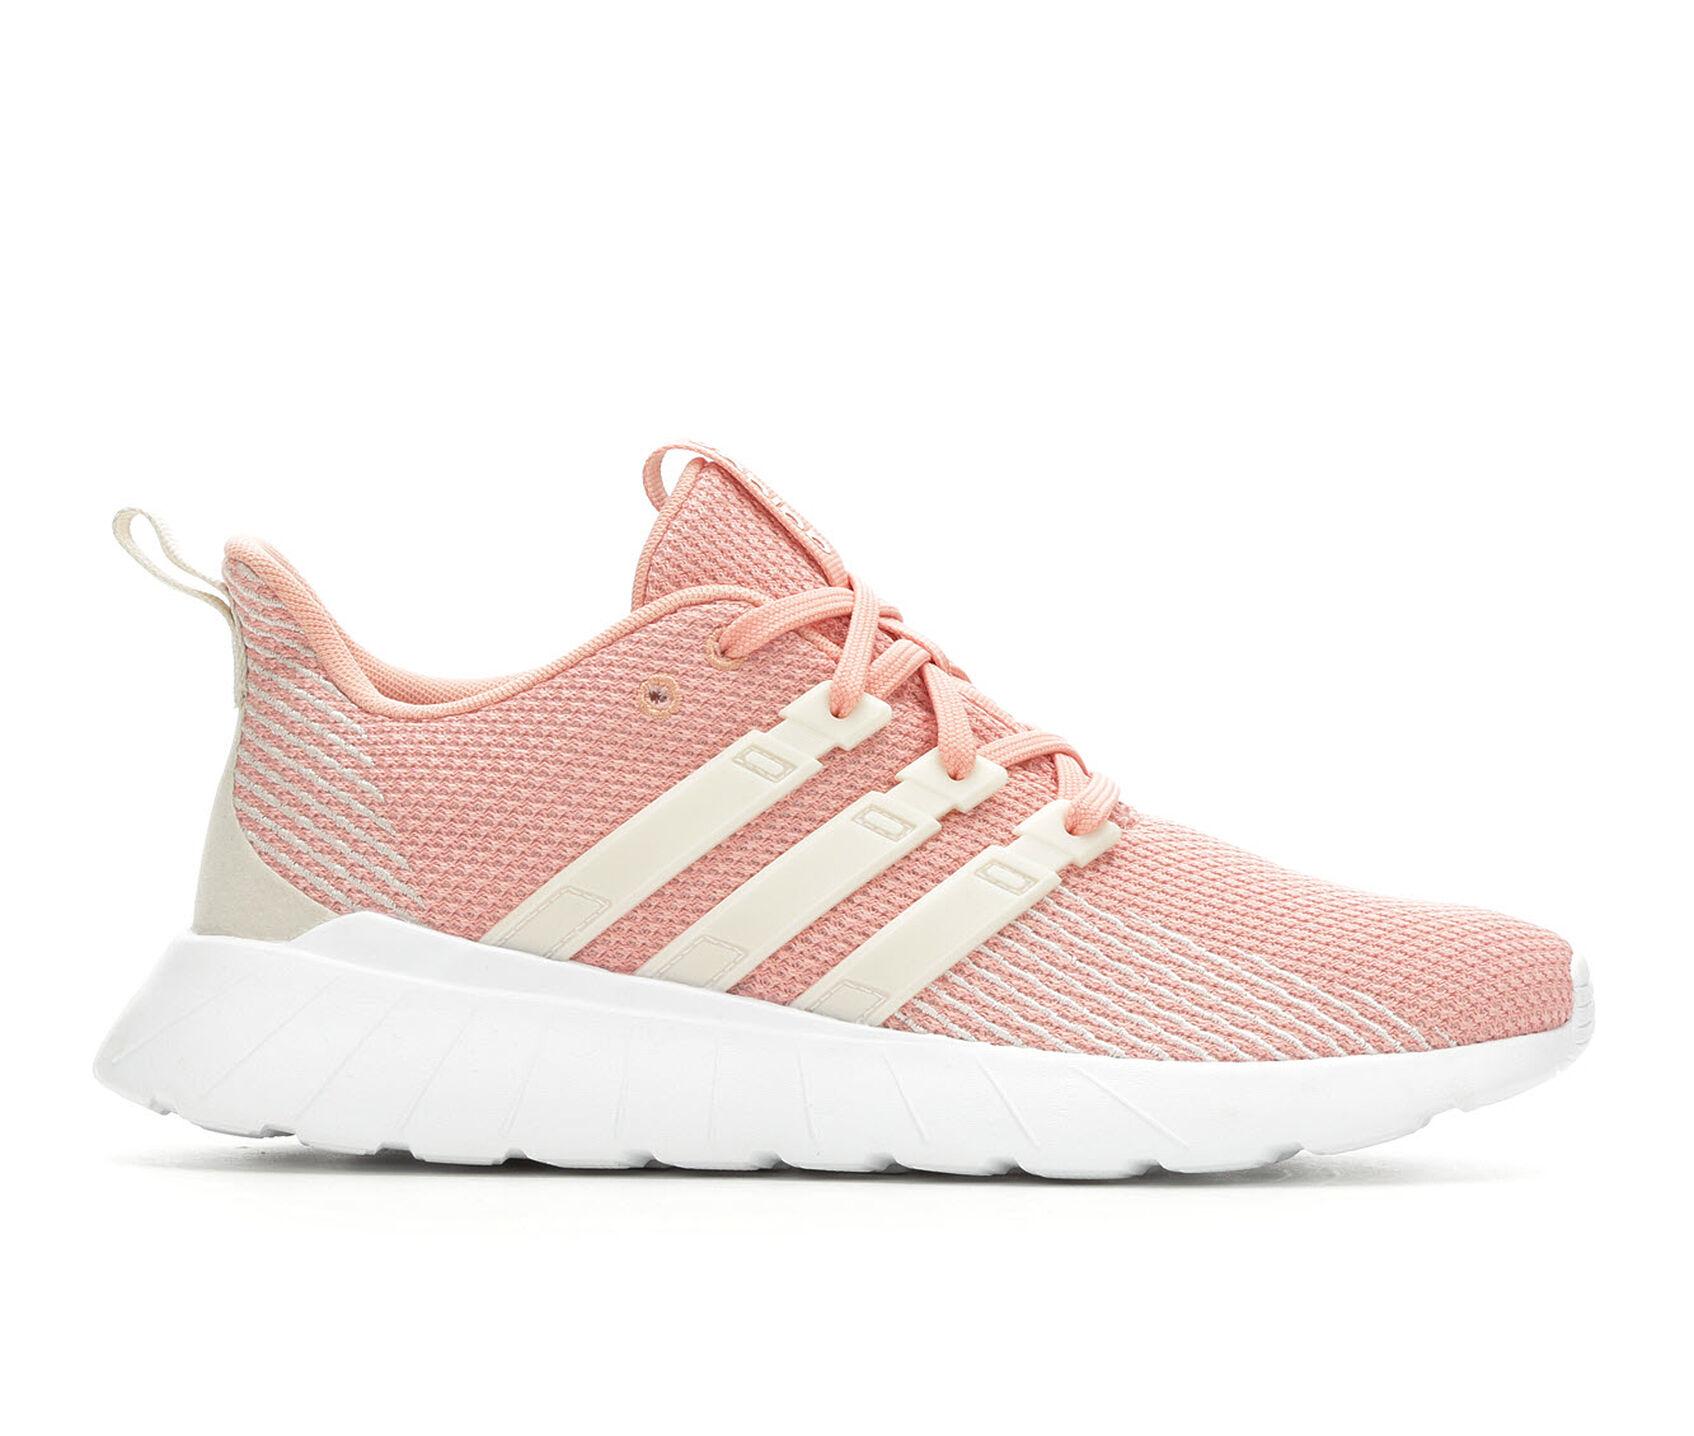 348fde45cd7 ... Adidas Questar Flow Sneakers. Previous